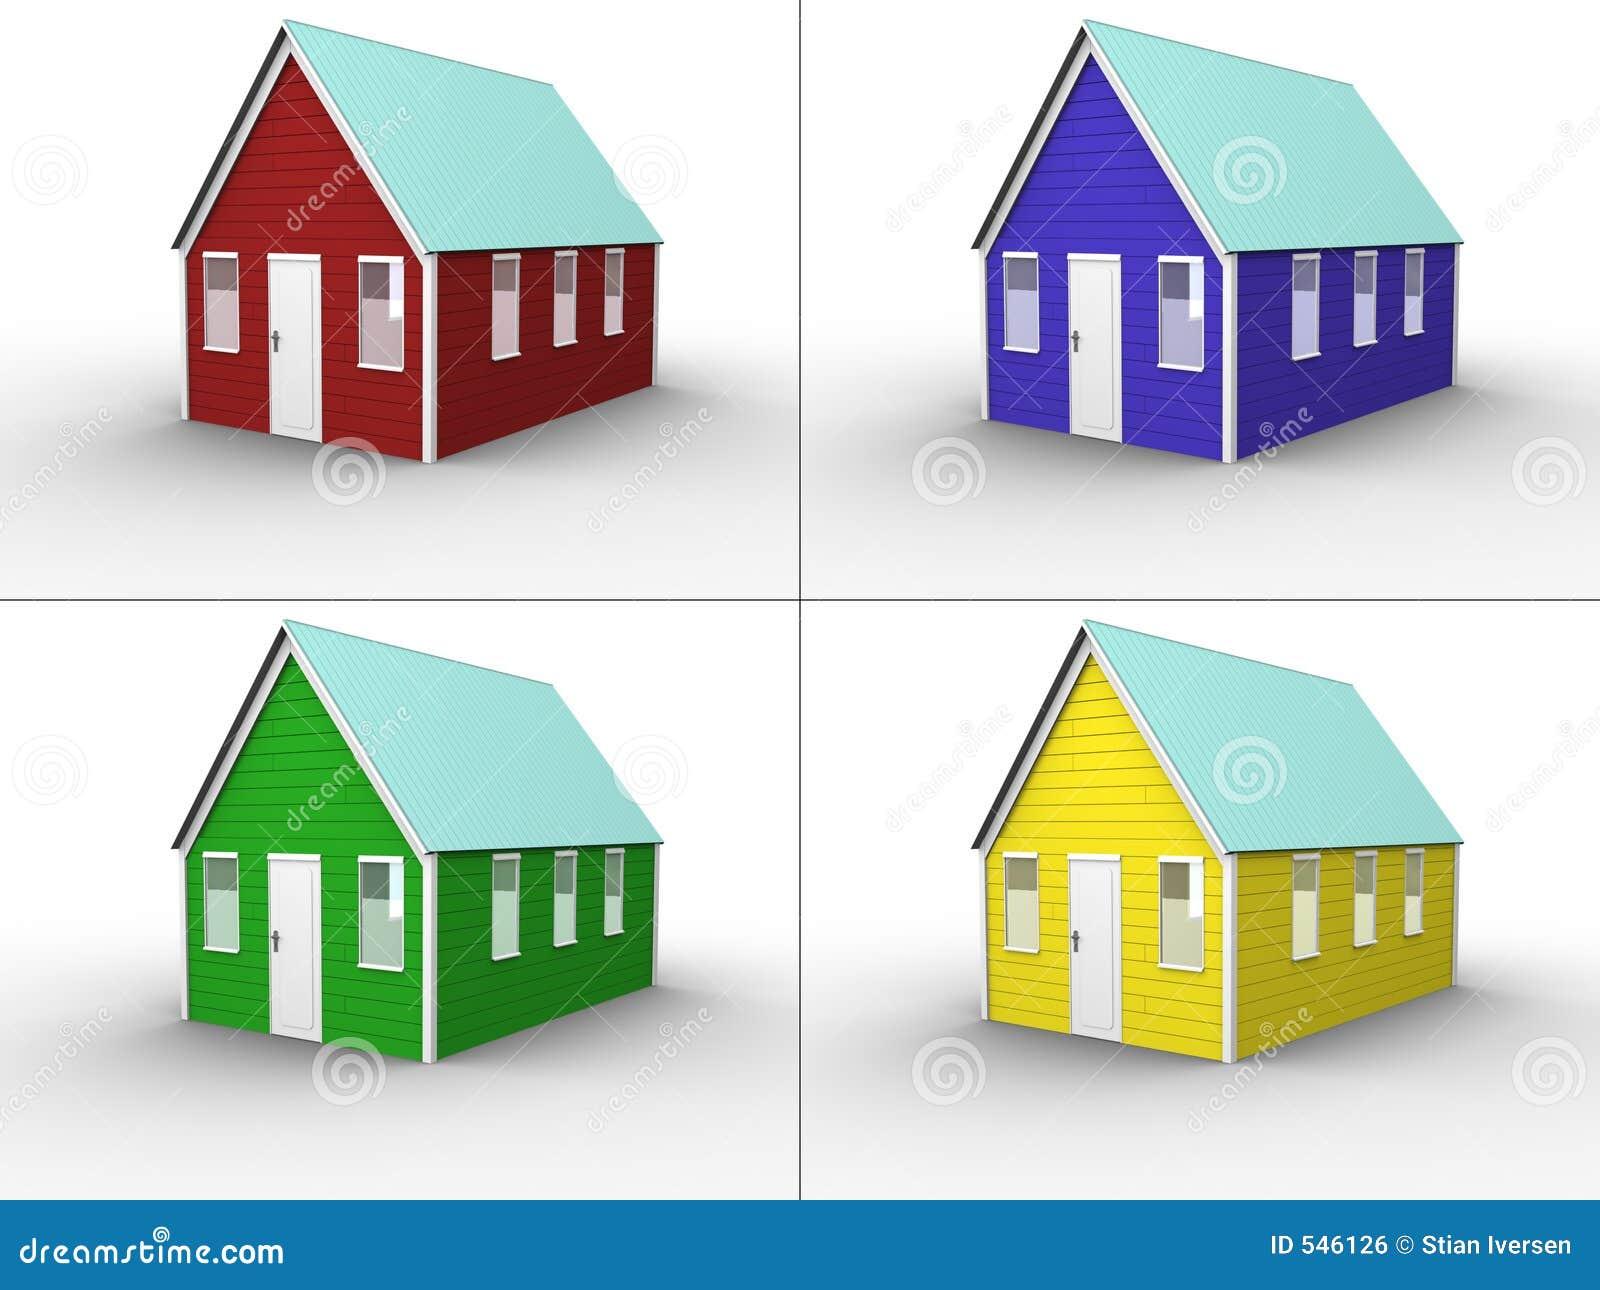 haus farben collage stock abbildung illustration von haupt 546126. Black Bedroom Furniture Sets. Home Design Ideas